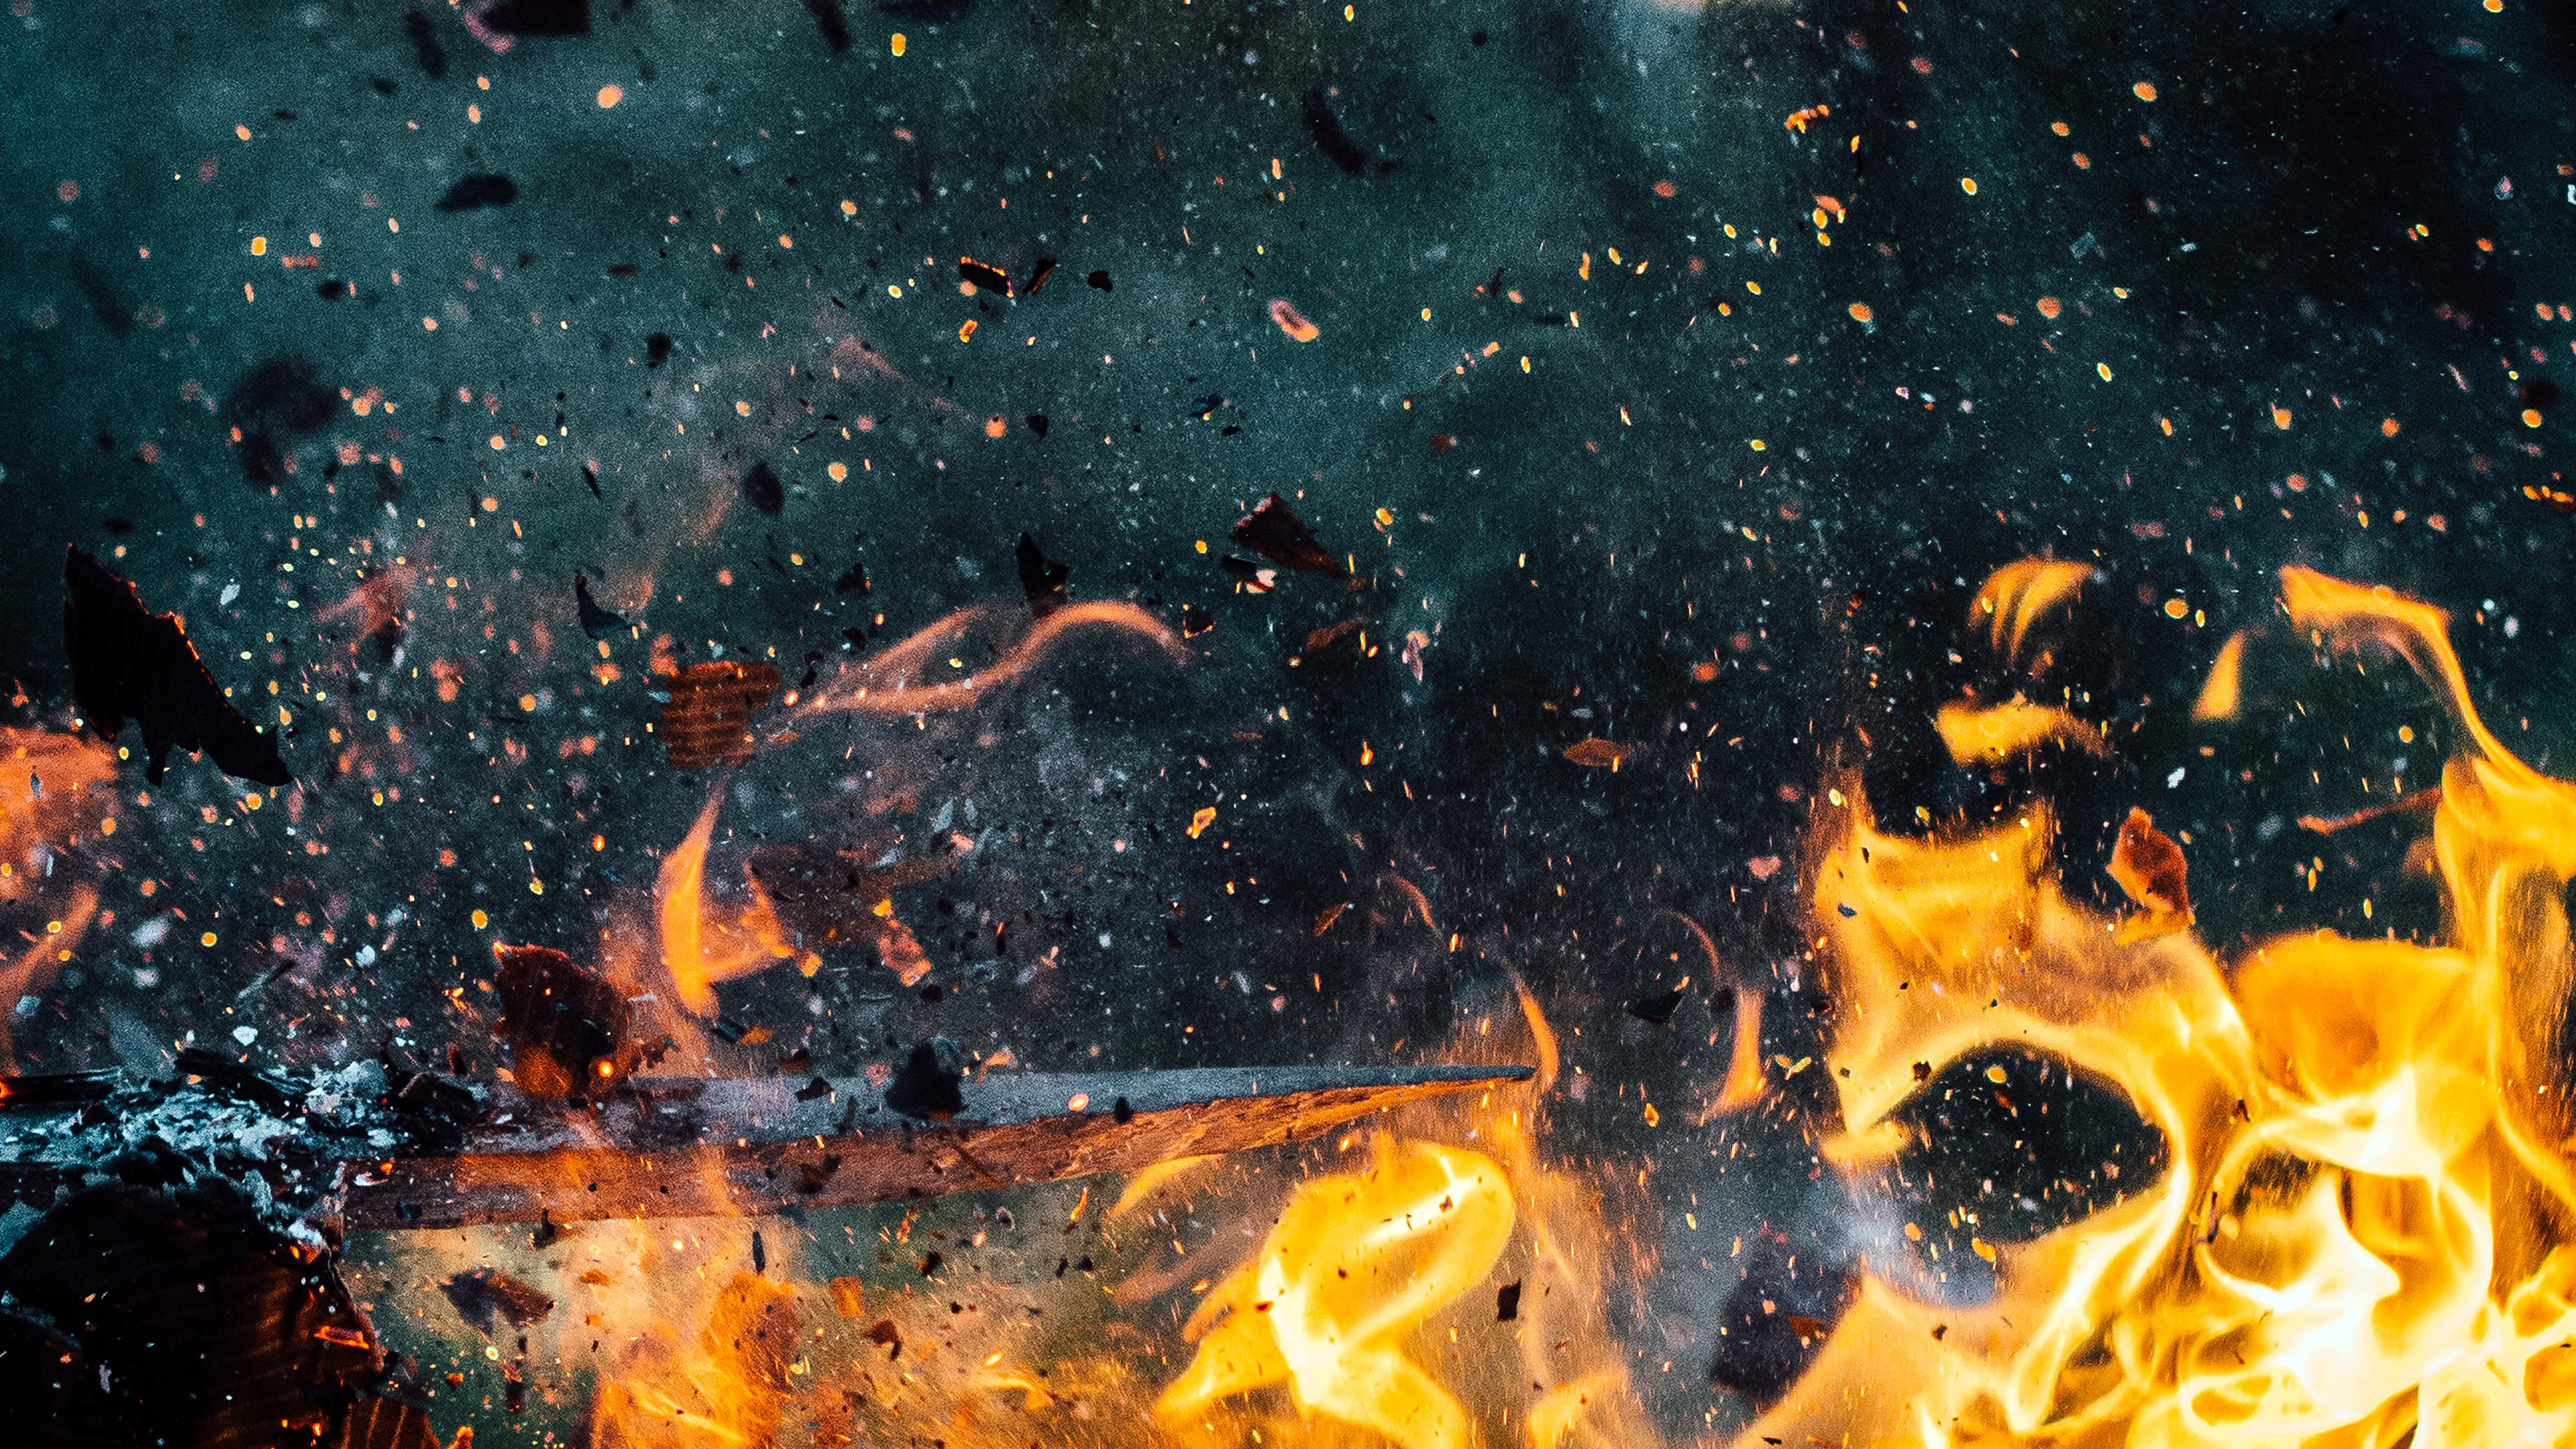 na94-wood-explosion-fire-art-wallpaper